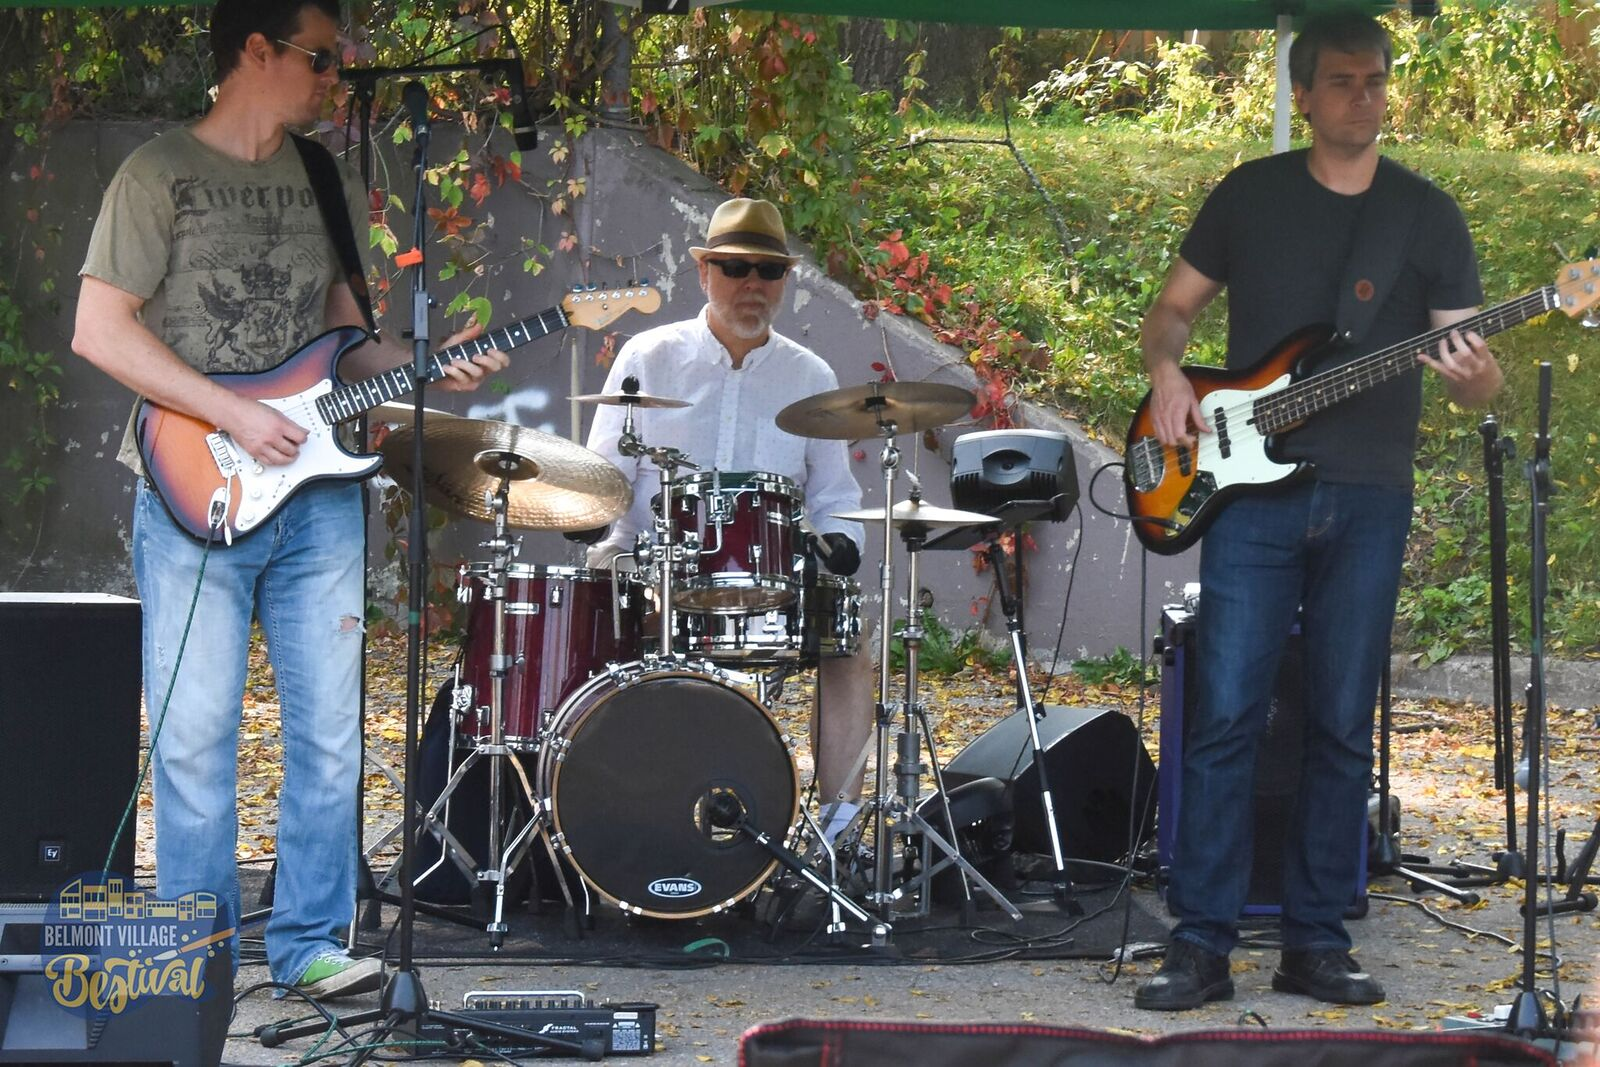 The Gary Cain Band